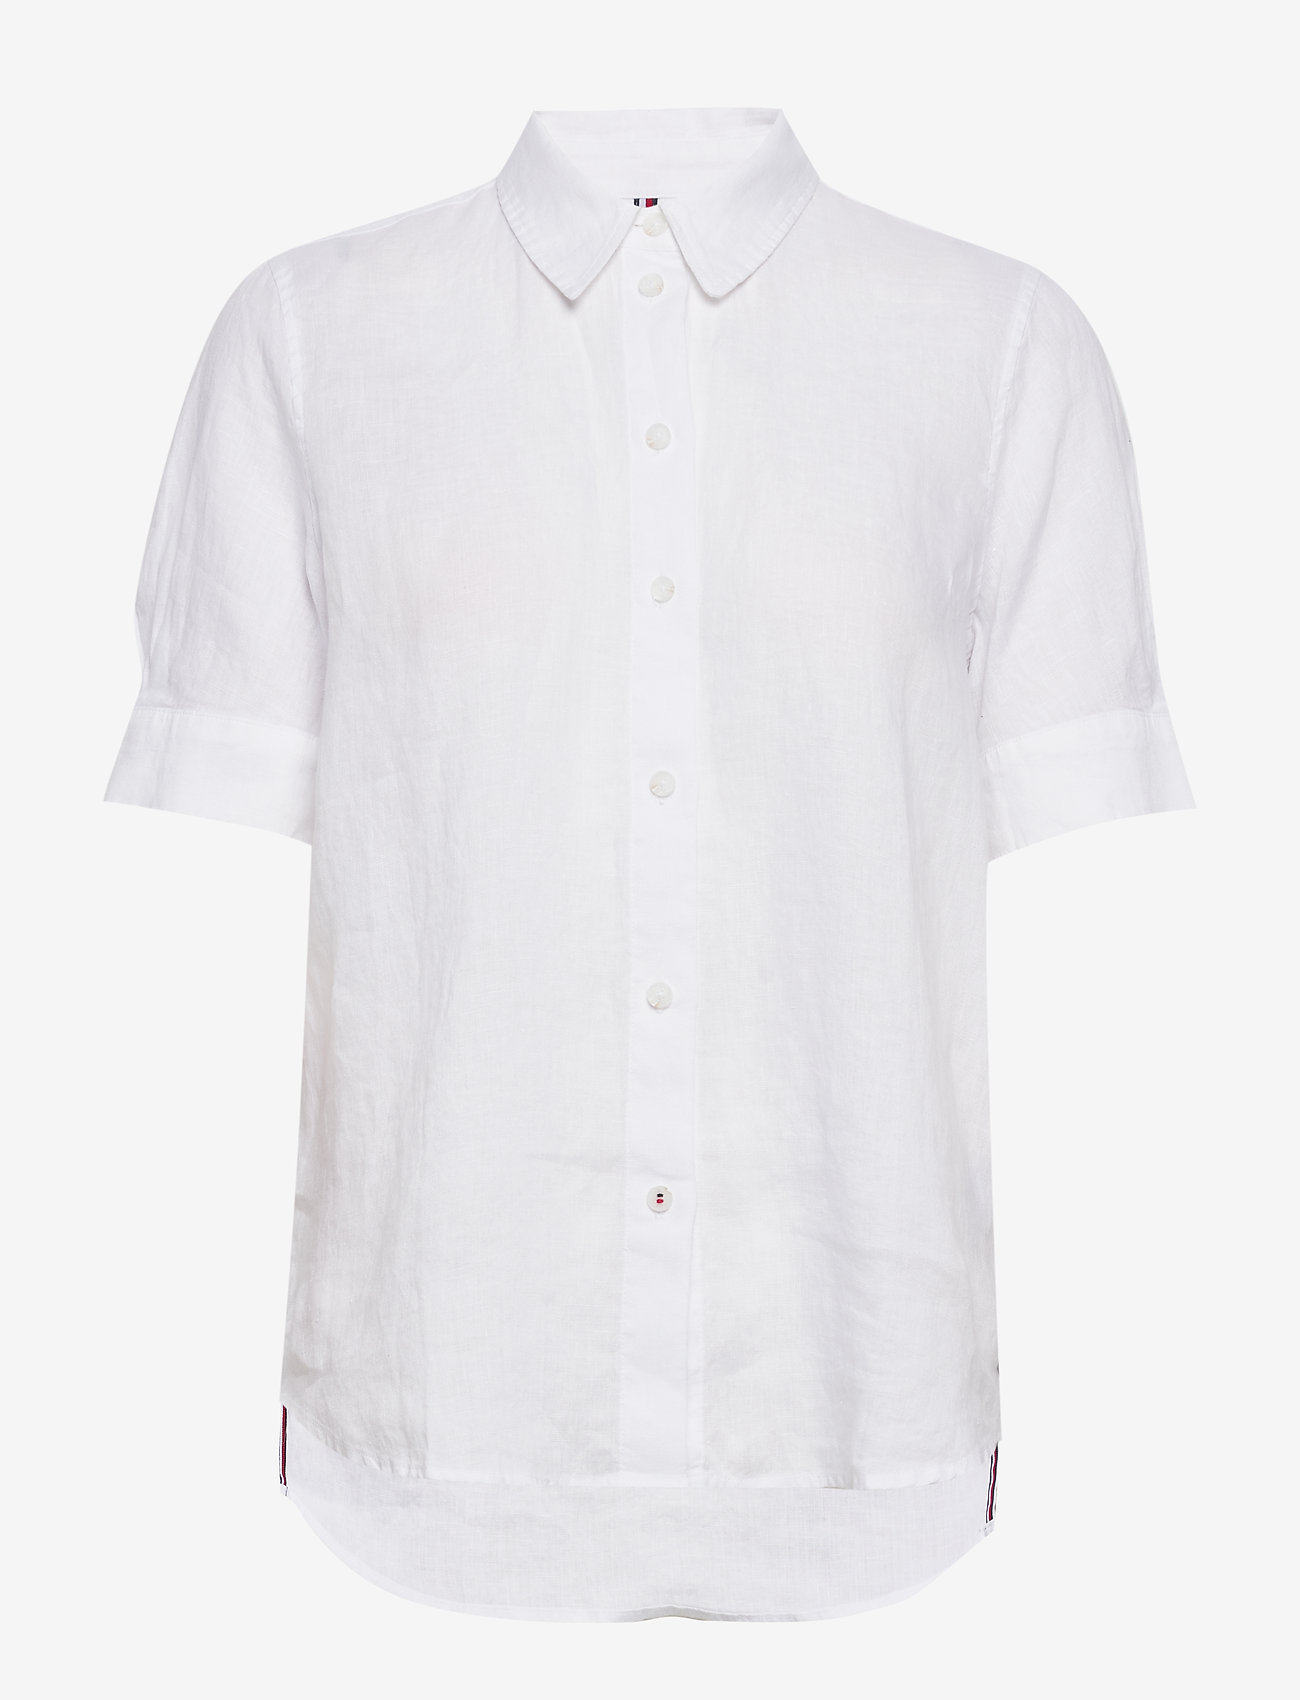 Tommy Hilfiger - TH ESSENTIAL PENELOP - overhemden met korte mouwen - white - 0